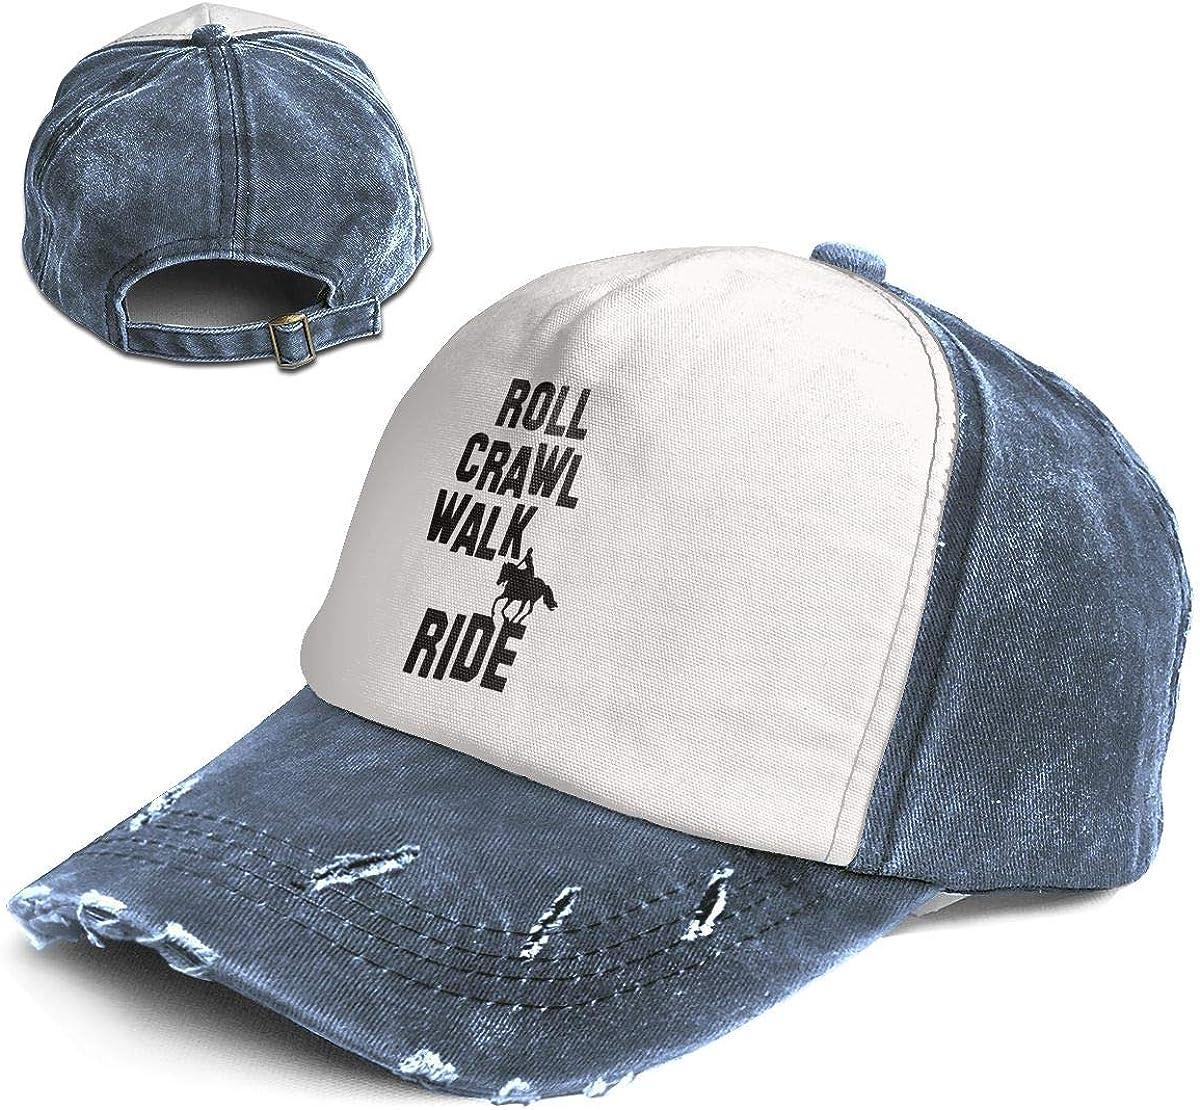 Crawl Walk Ride Trend Printing Cowboy Hat Fashion Baseball Cap for Men and Women Black and White